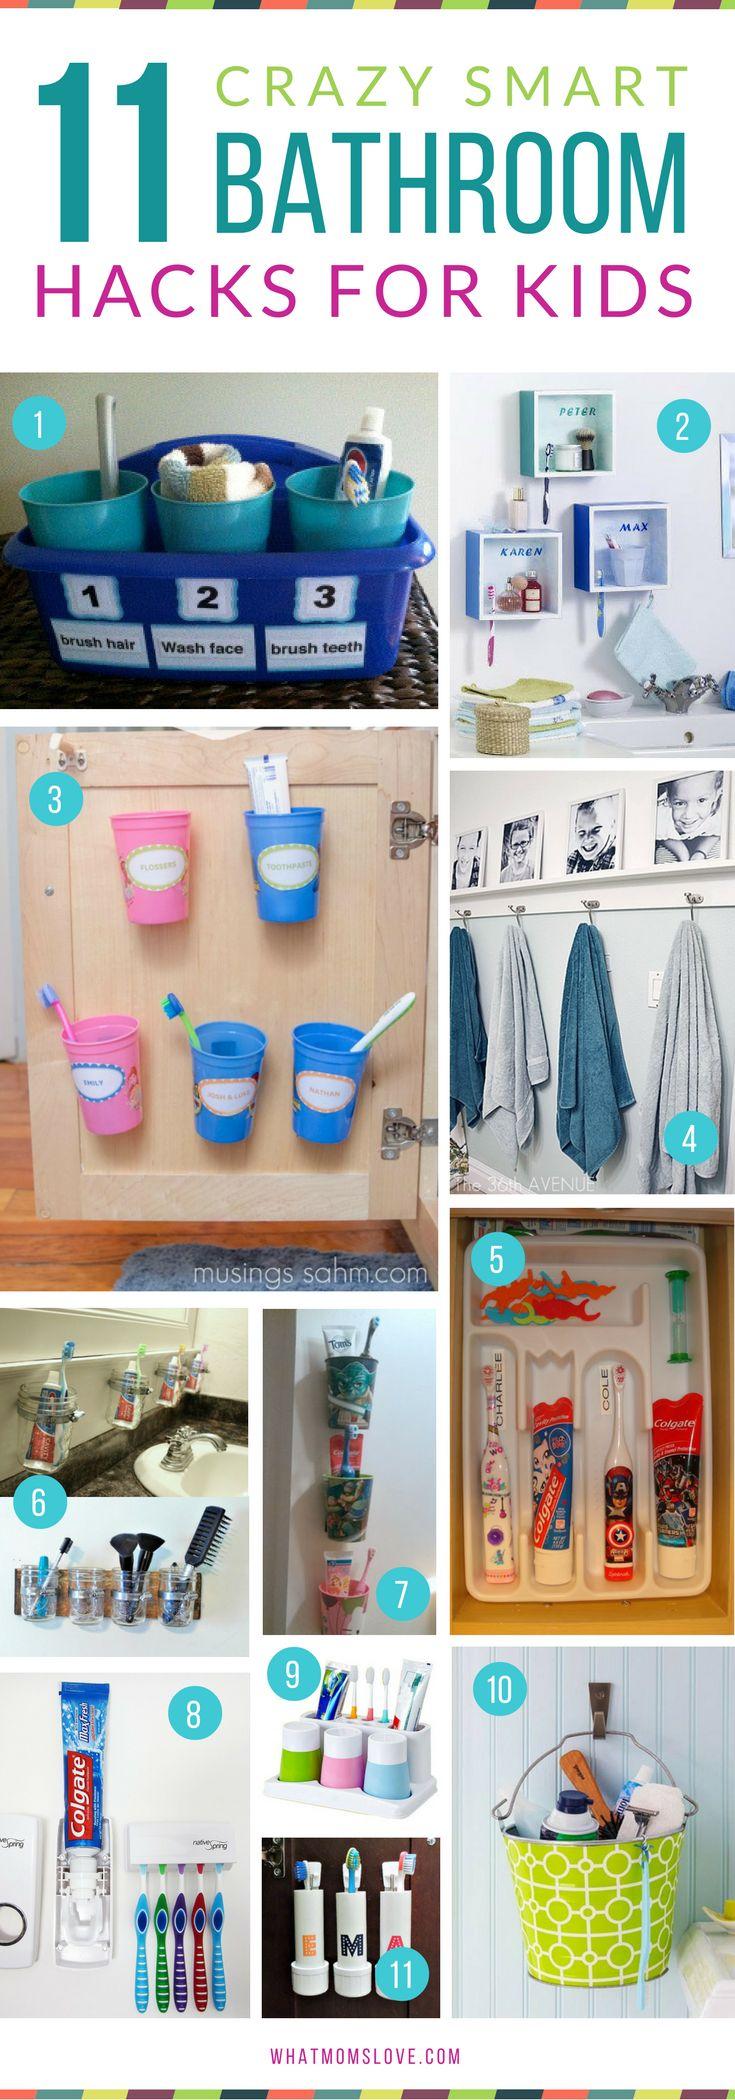 best Shelving u Cute Storage Ideas images on Pinterest